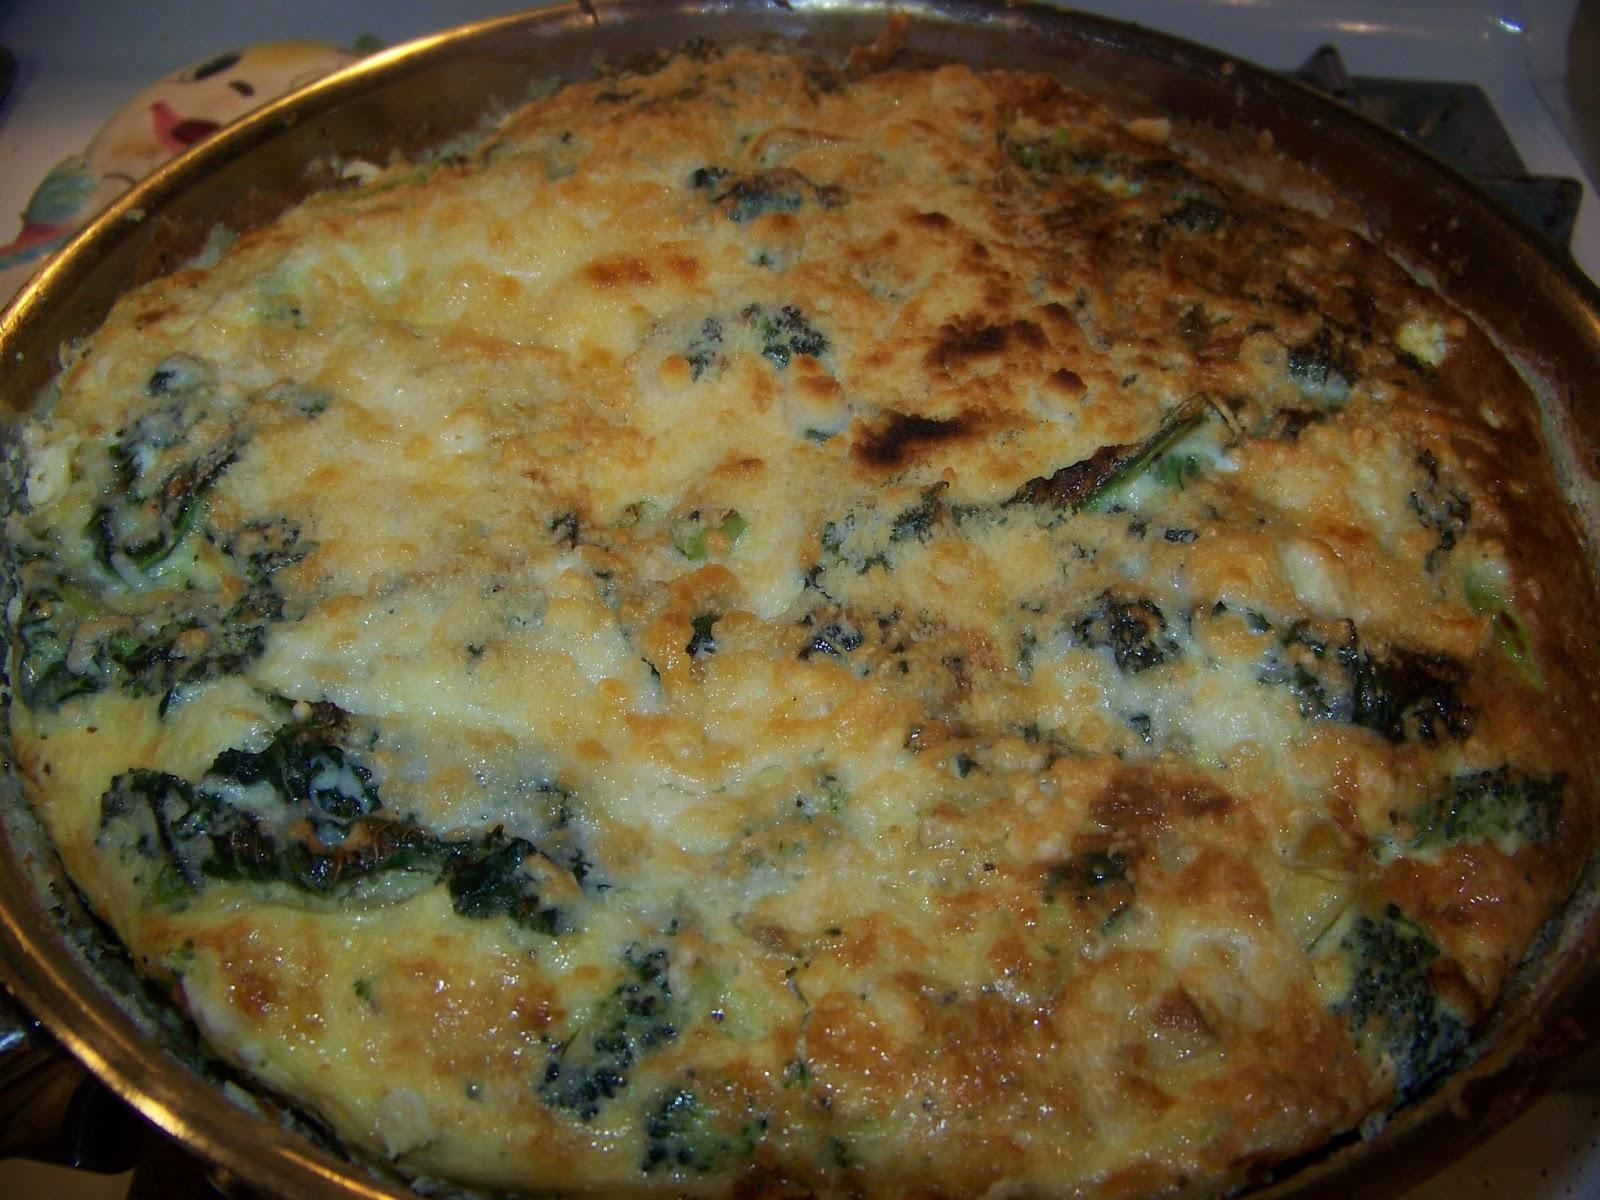 Sarah's Adventures in Culinary Experimentation: Broccoli ...